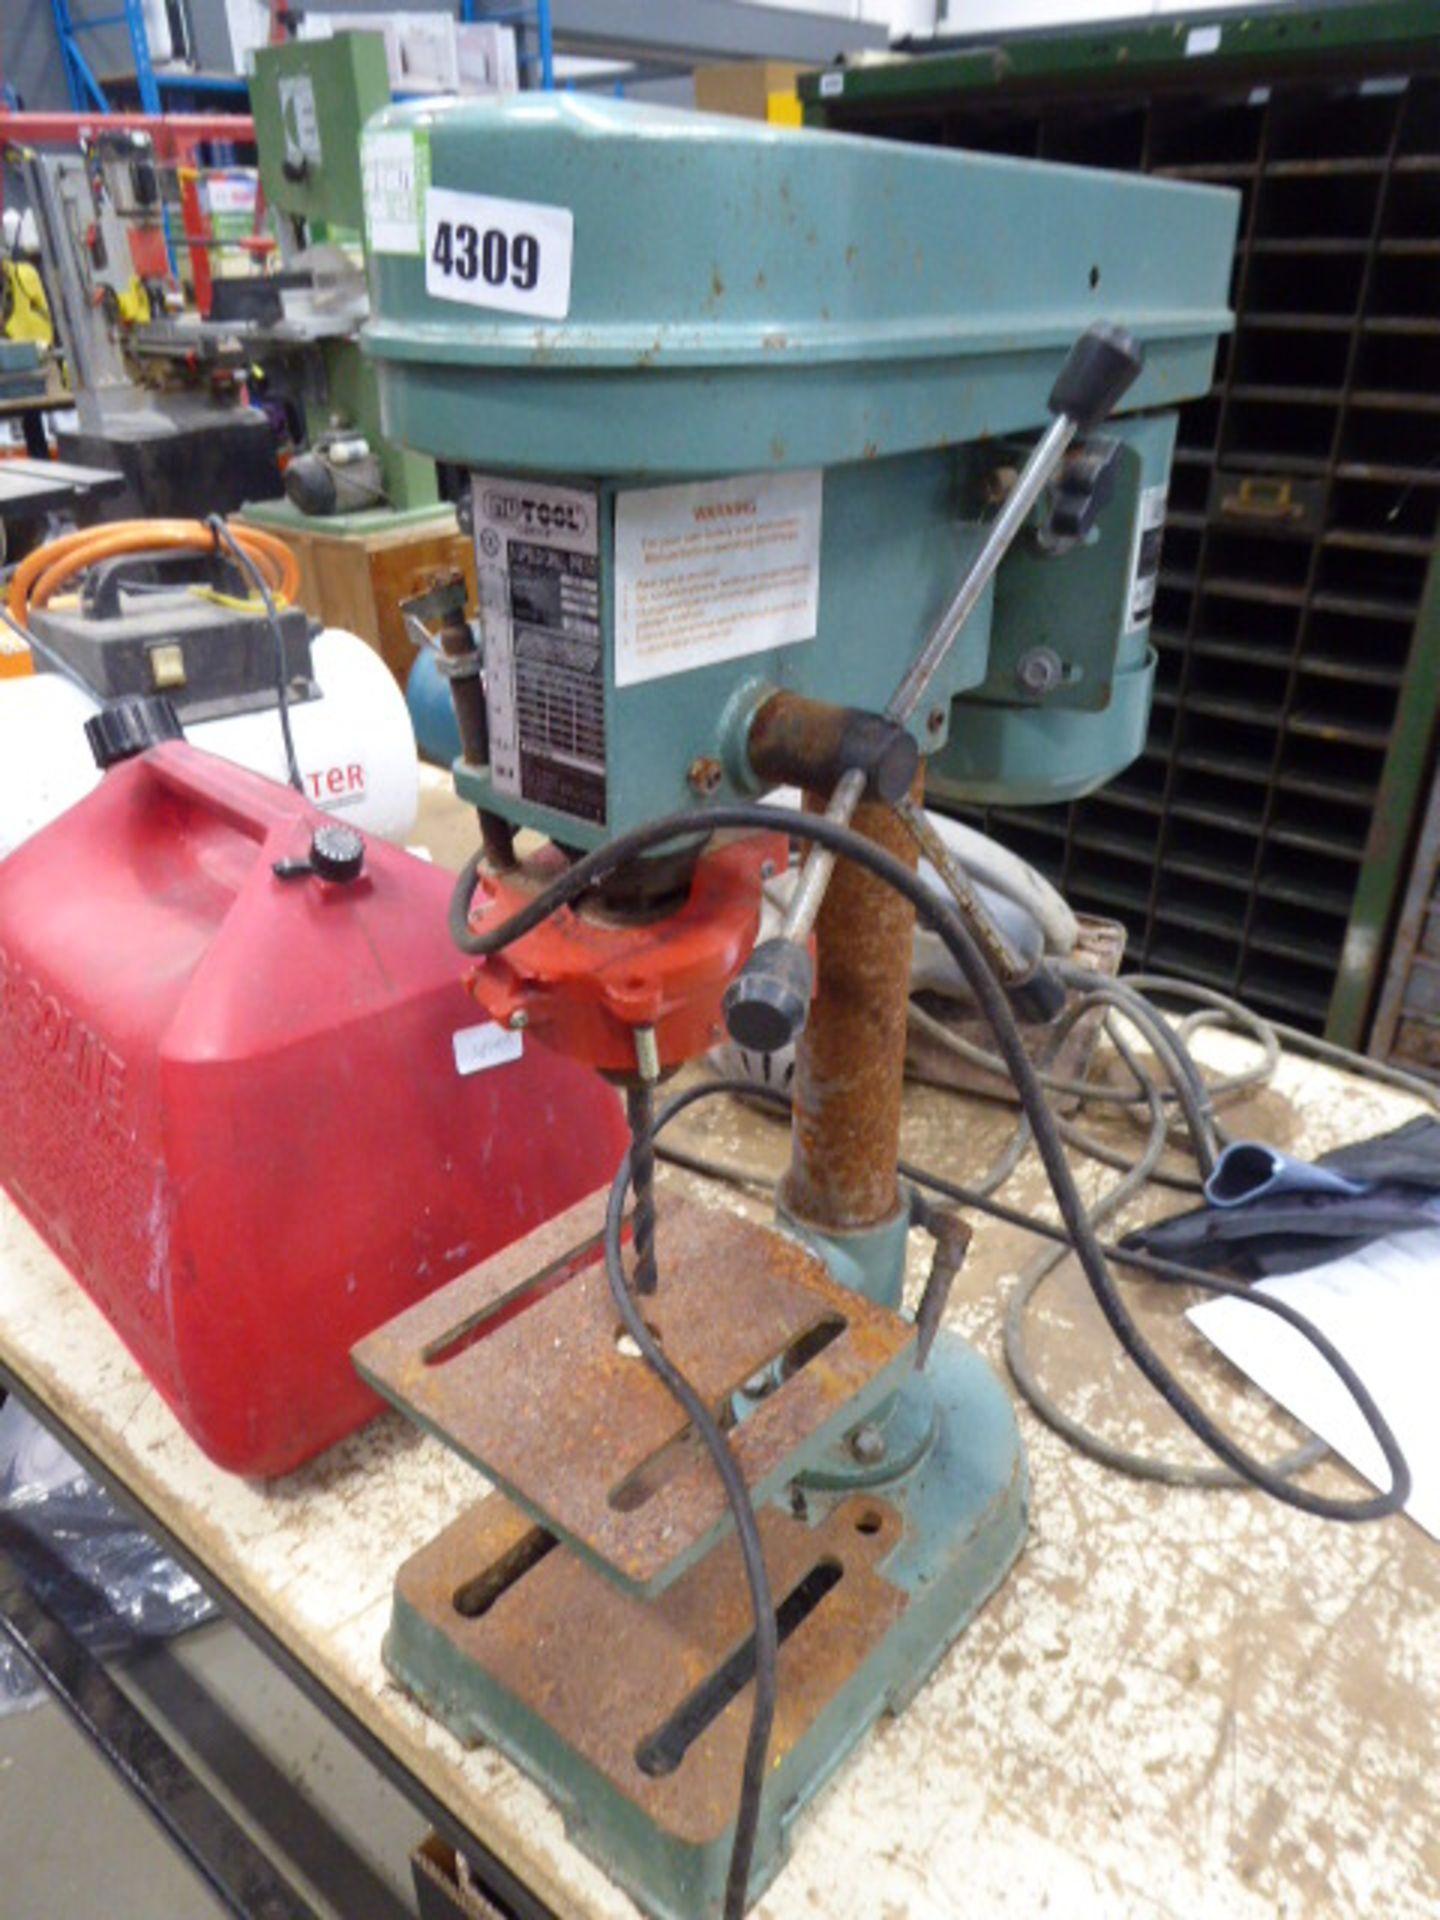 Newtool small bench drill